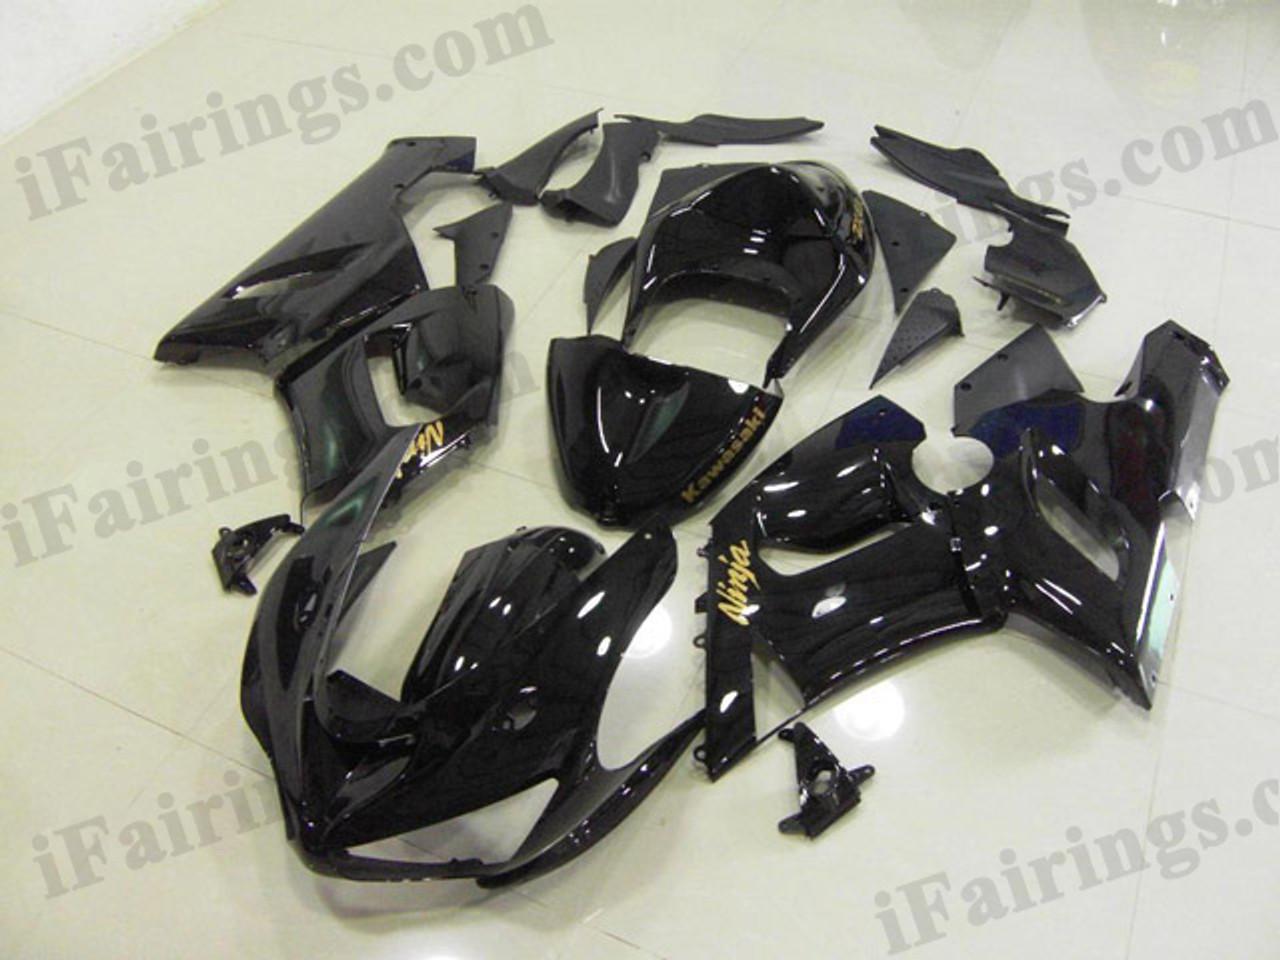 ZX6R 636 2005 2006 glossy black fairings, 2005 2006 ZX6R decals